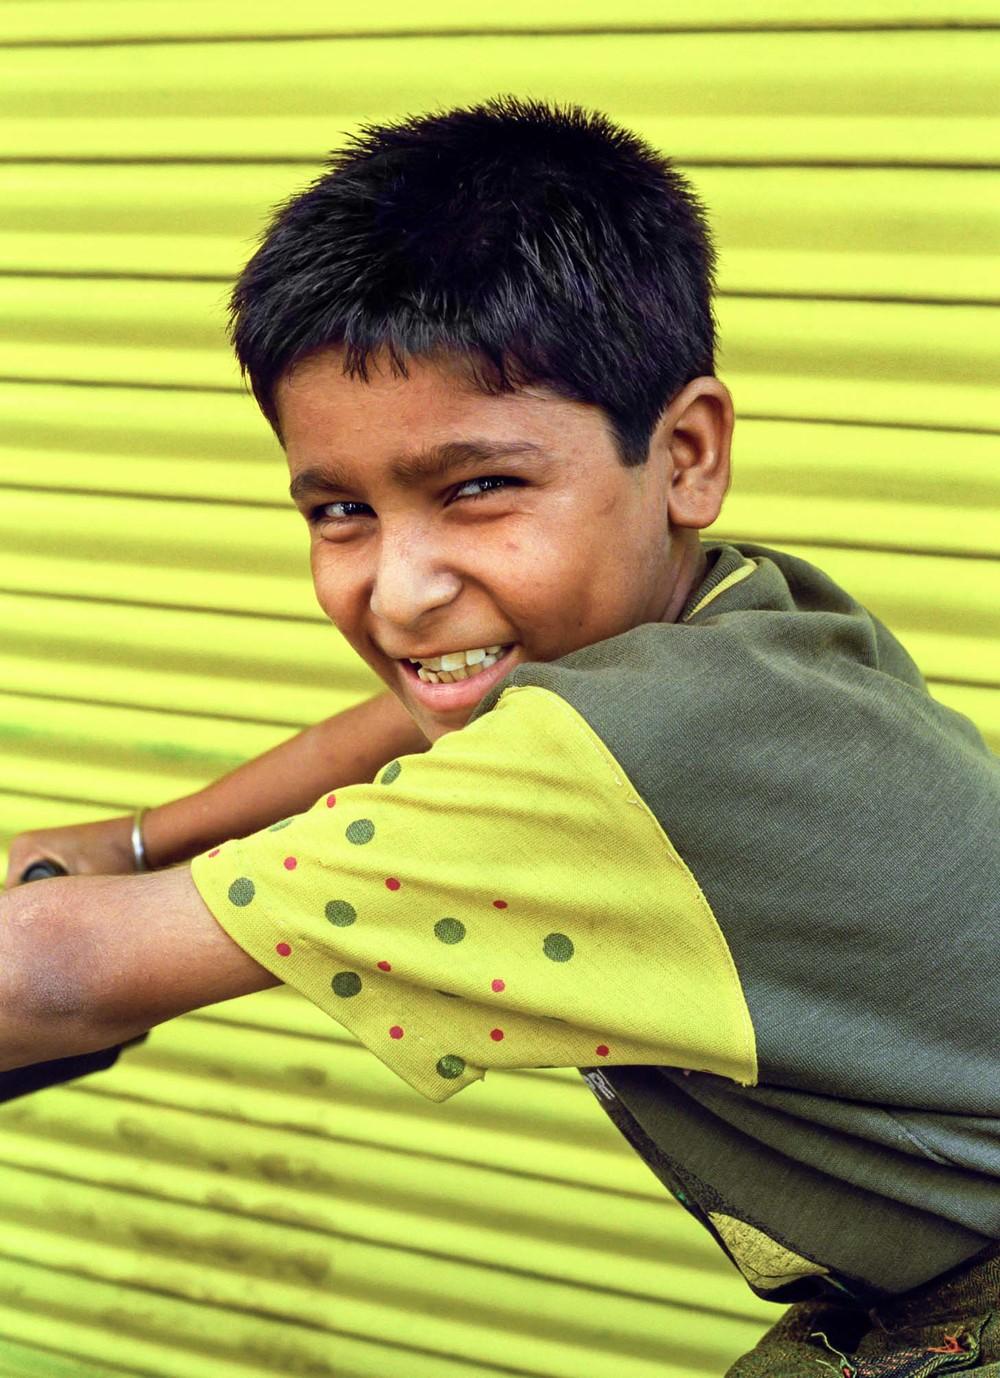 Young boy, Jaipur, India